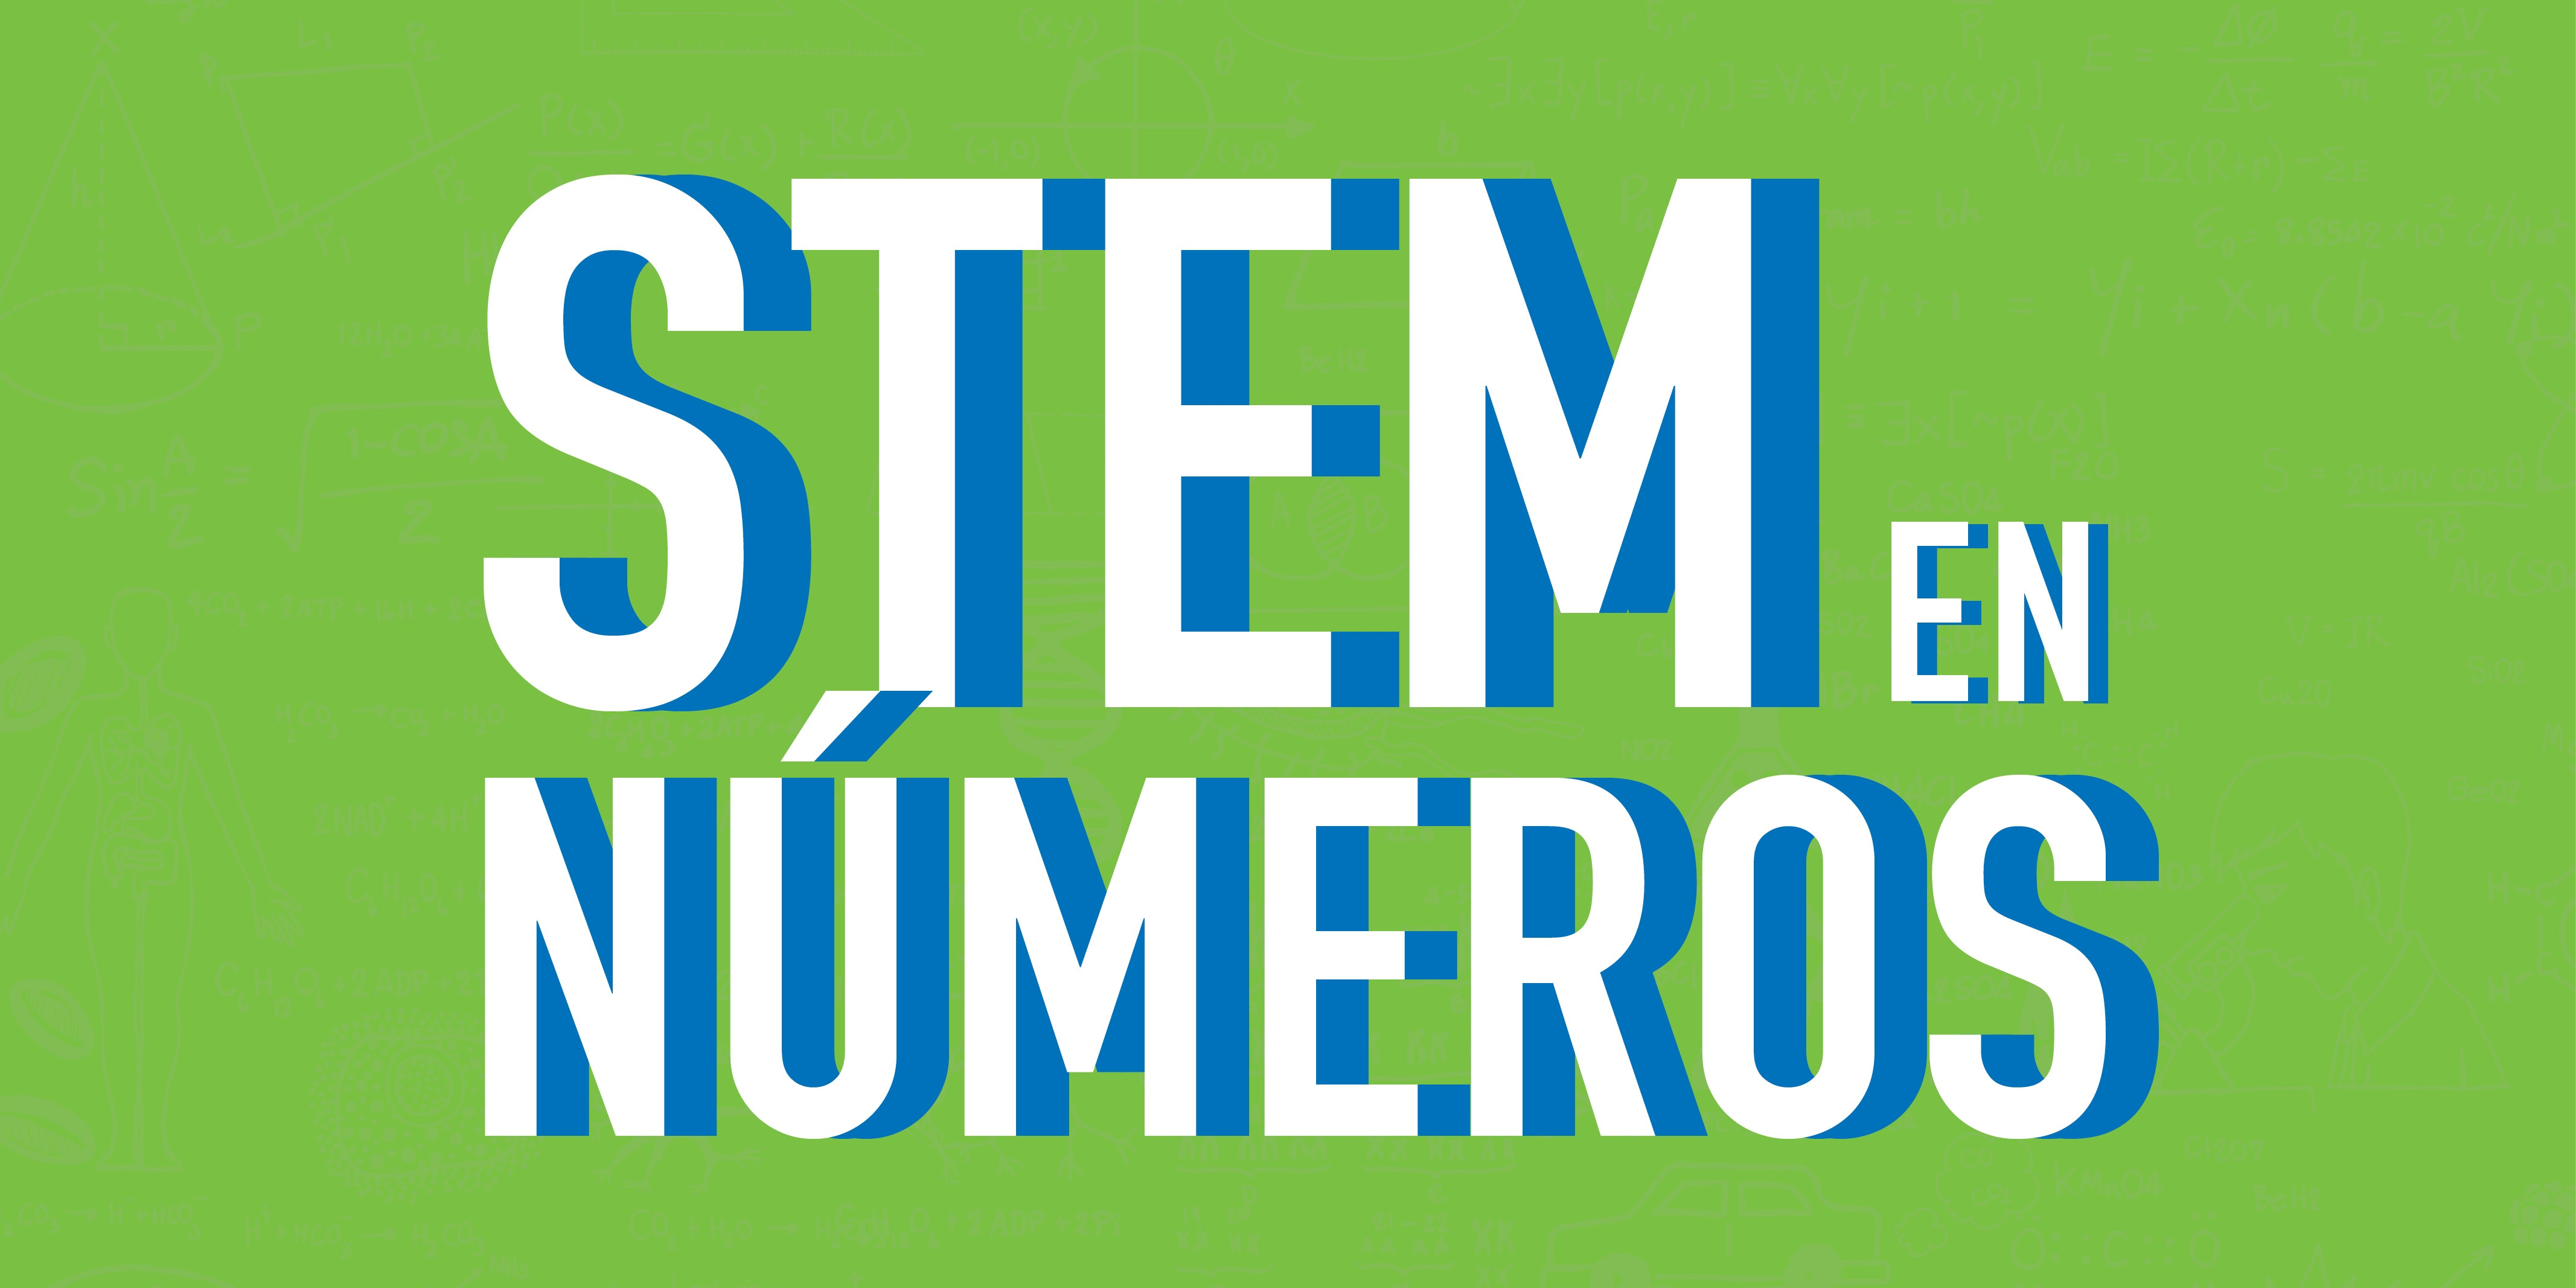 STEM_En_Numeros_Blog22.jpg